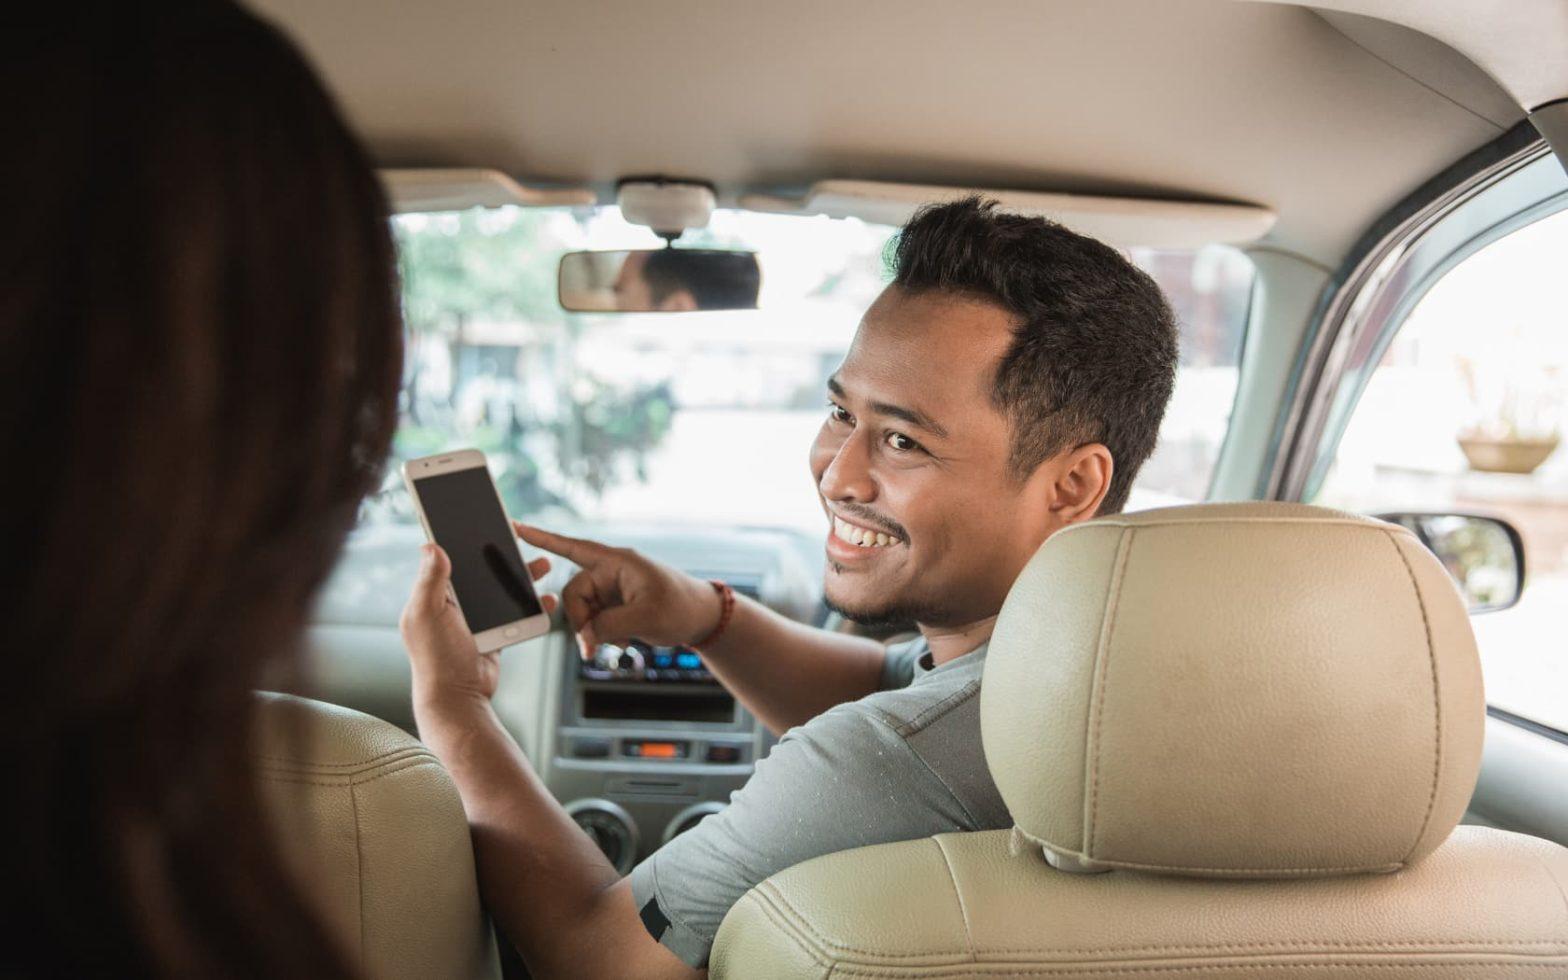 Uber vs Lyft vs Via: The Ultimate Rideshare Comparison Guide - Which is Cheapest?